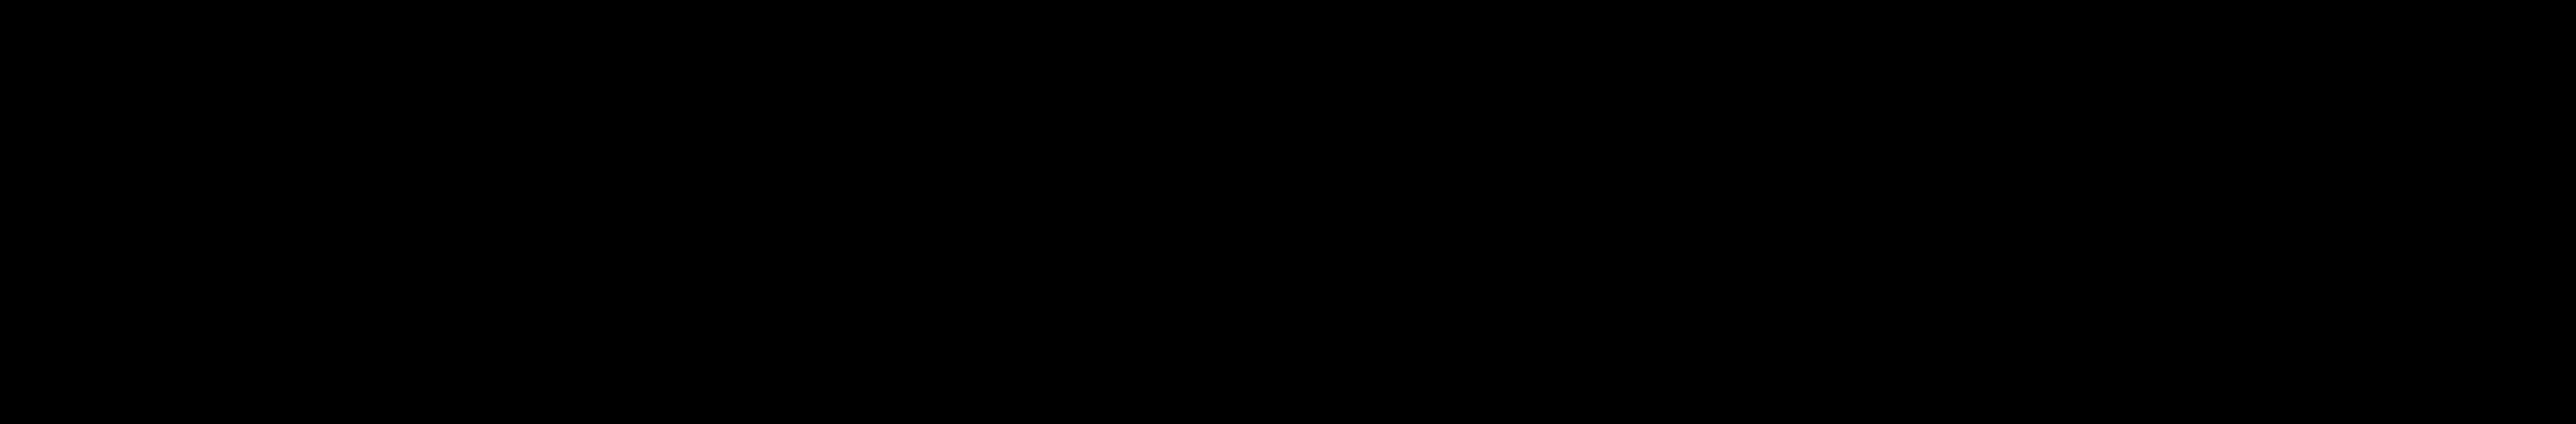 Popscure